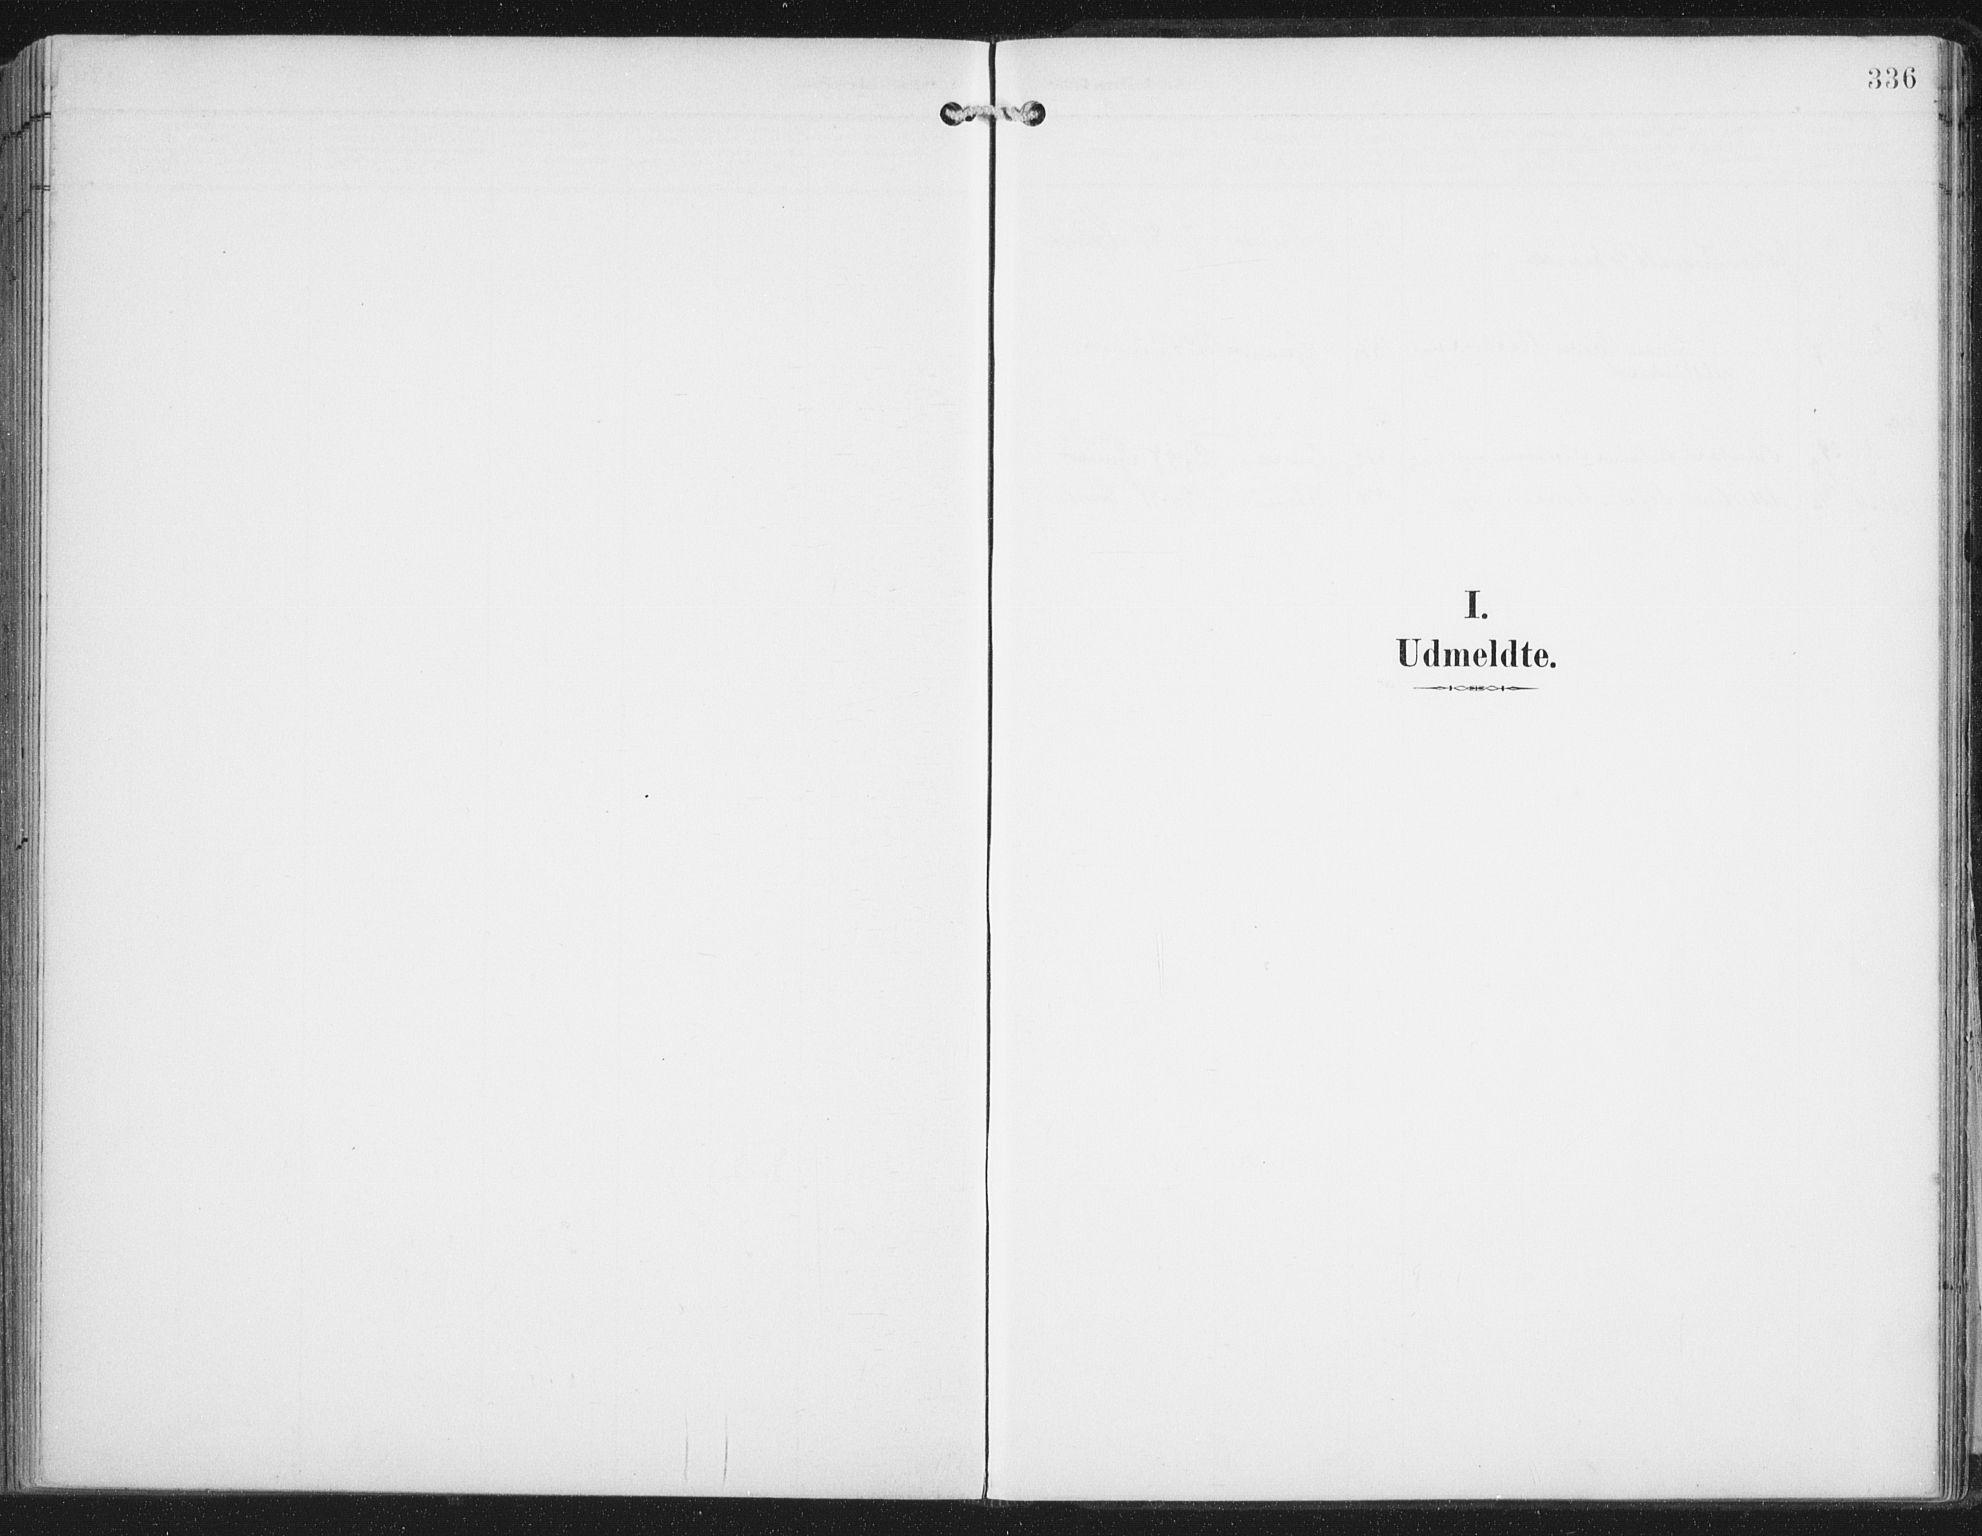 SAT, Ministerialprotokoller, klokkerbøker og fødselsregistre - Nordland, 876/L1098: Ministerialbok nr. 876A04, 1896-1915, s. 336